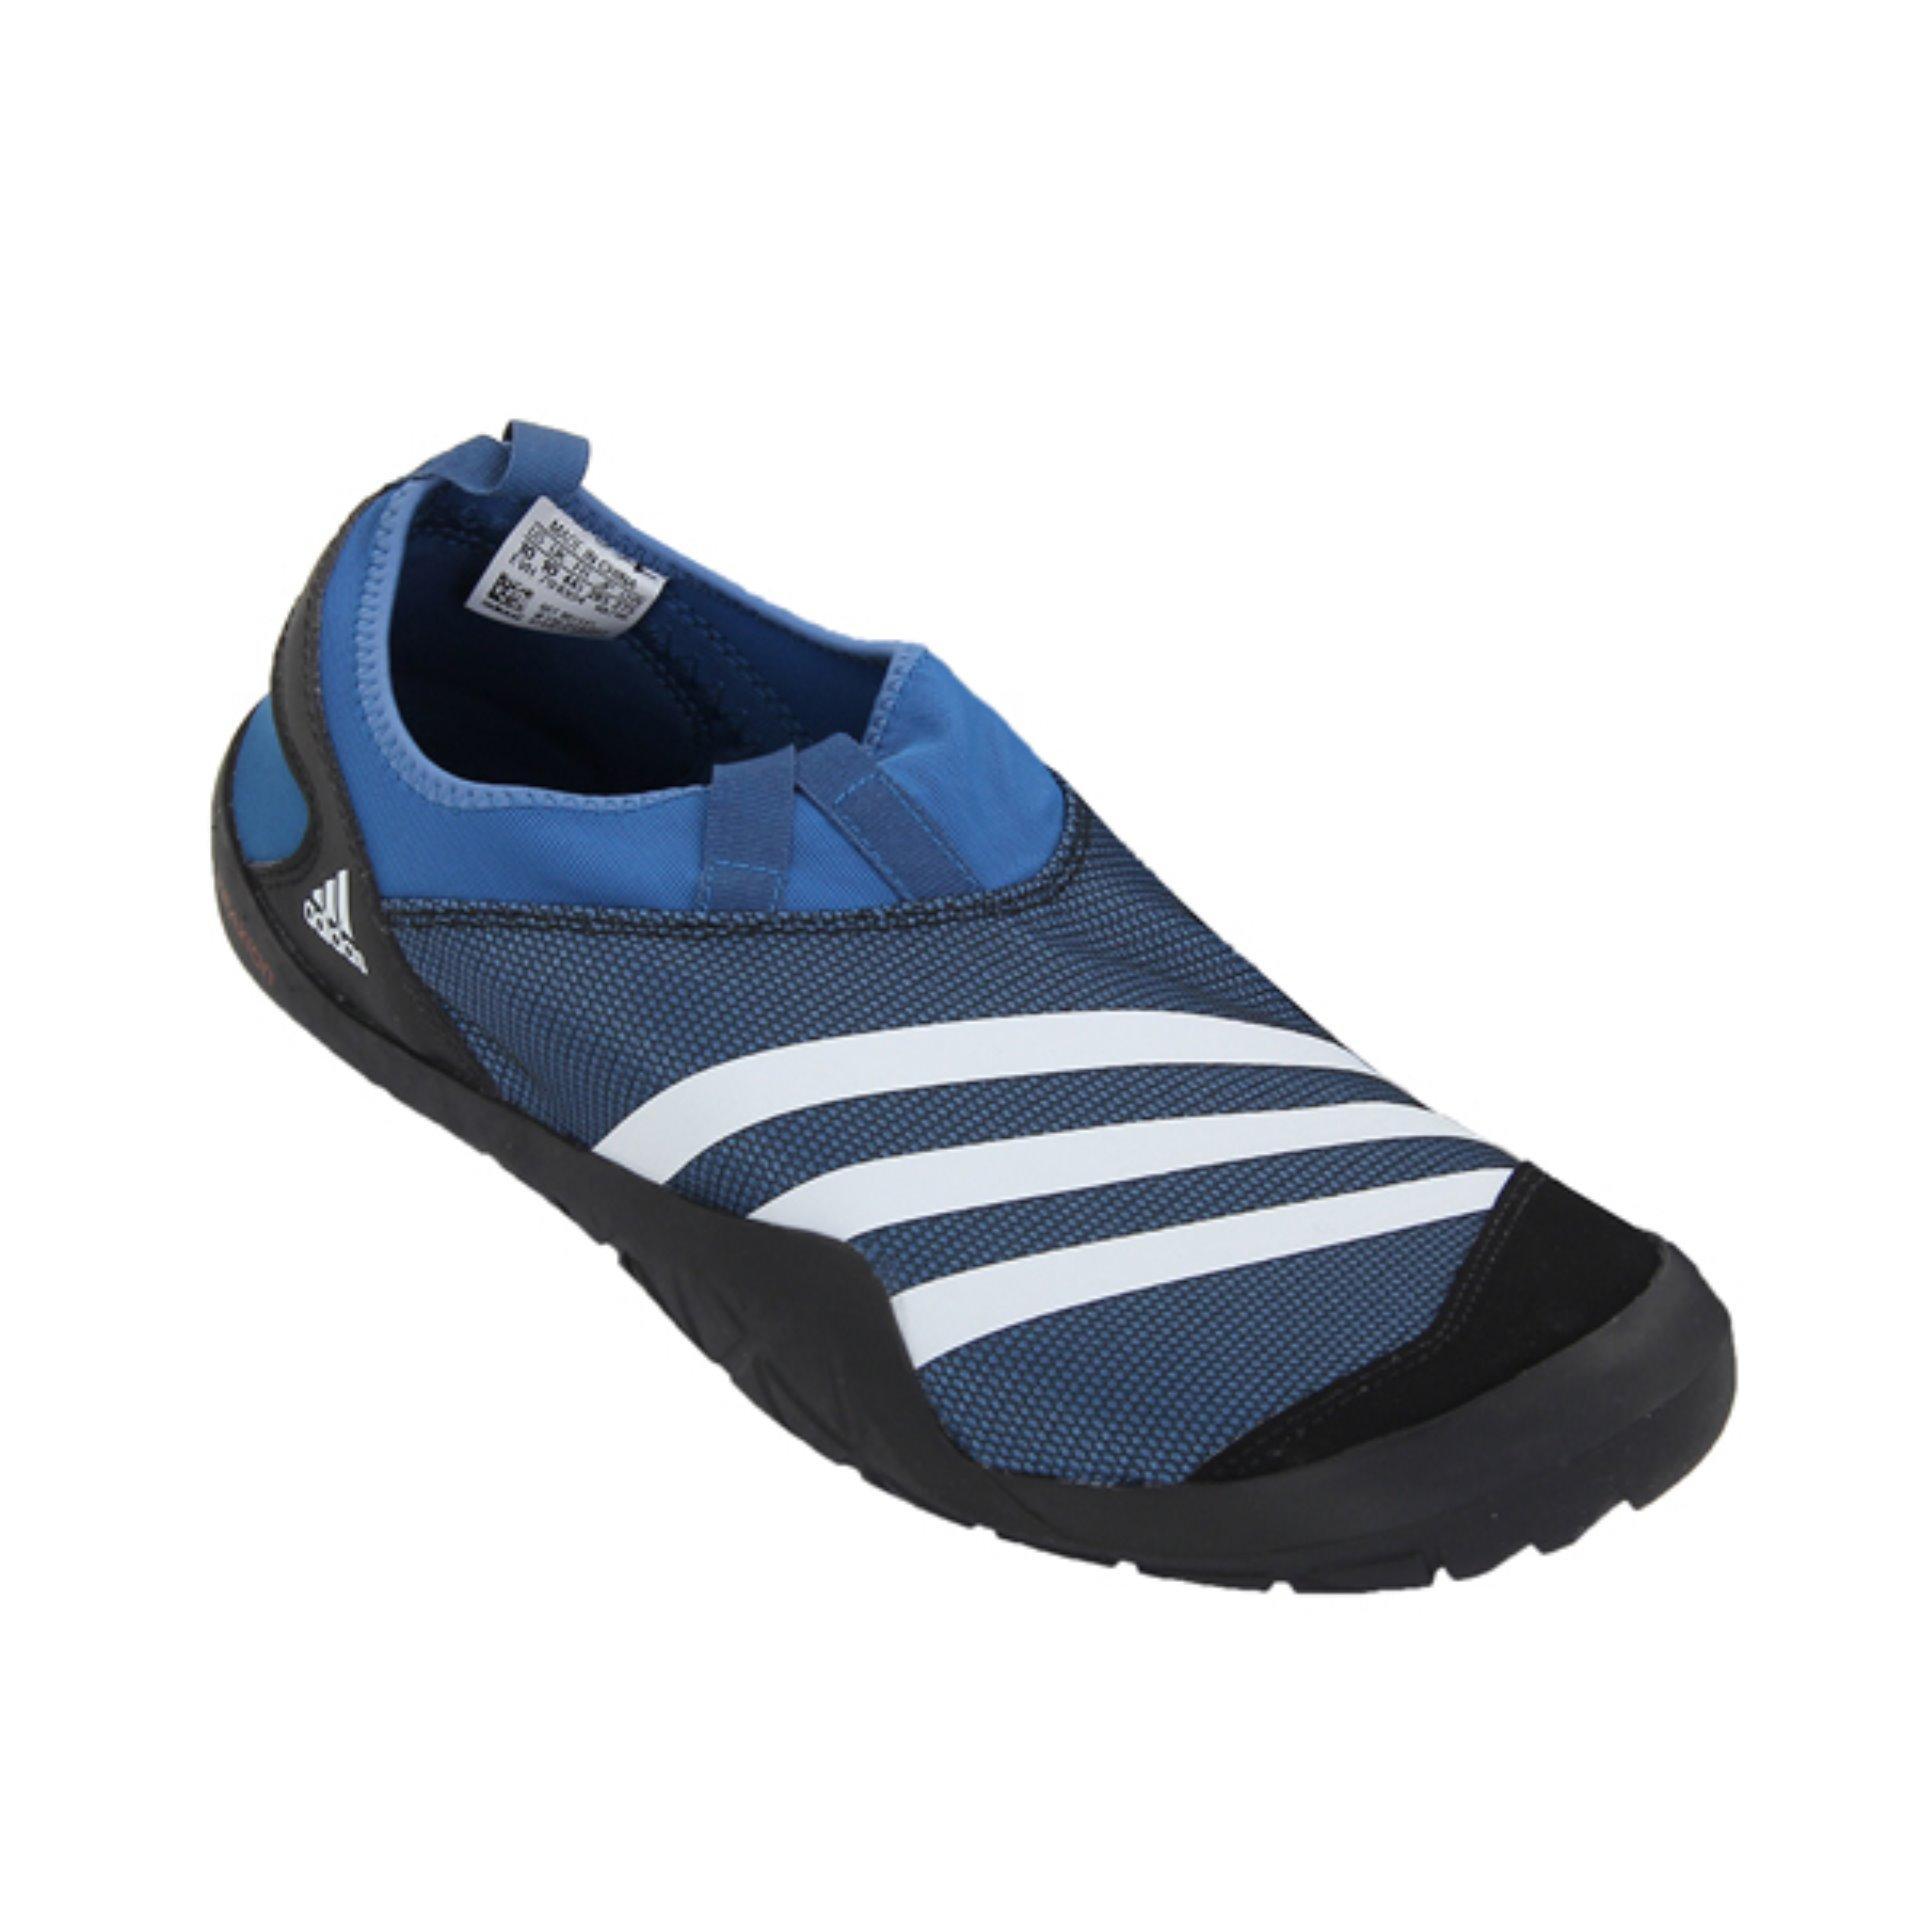 Jual Beli Adidas Sepatu Outdoor Water Sport Climacool Jawpaw Slip On Kurobe  Pria Bb1913 Bb5445 88045bf76e